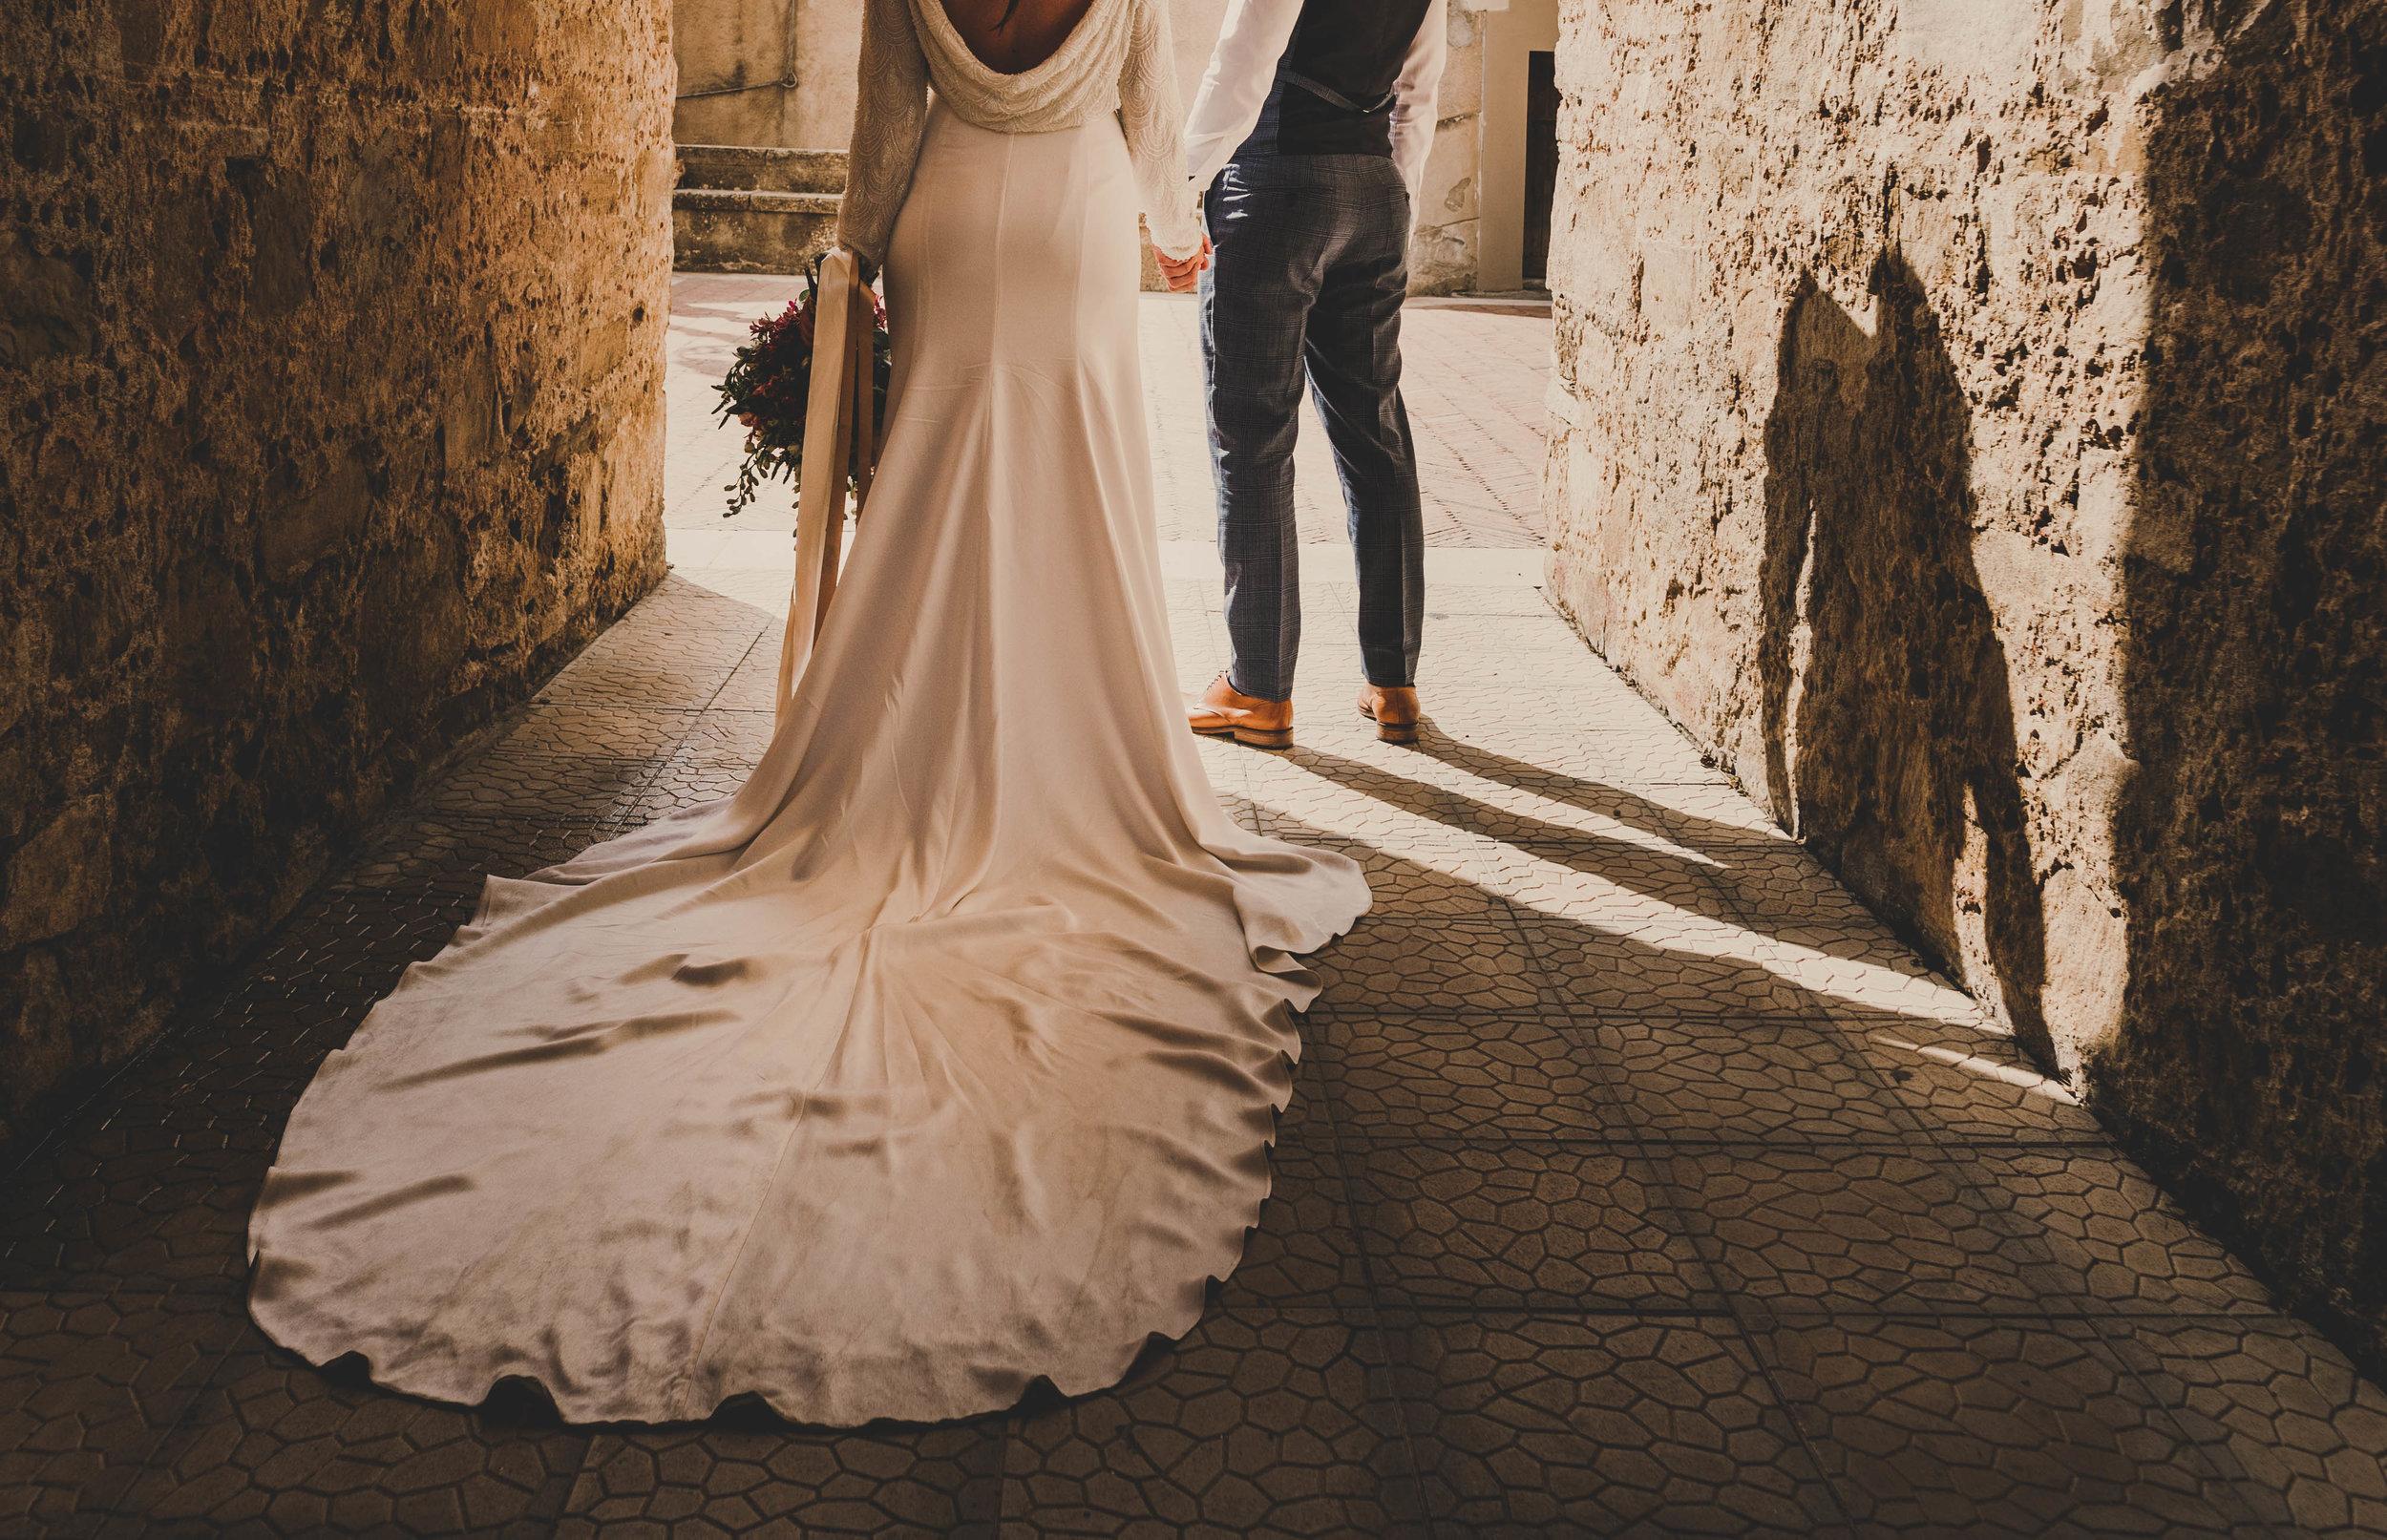 italy-destination-wedding-photo (6).jpg